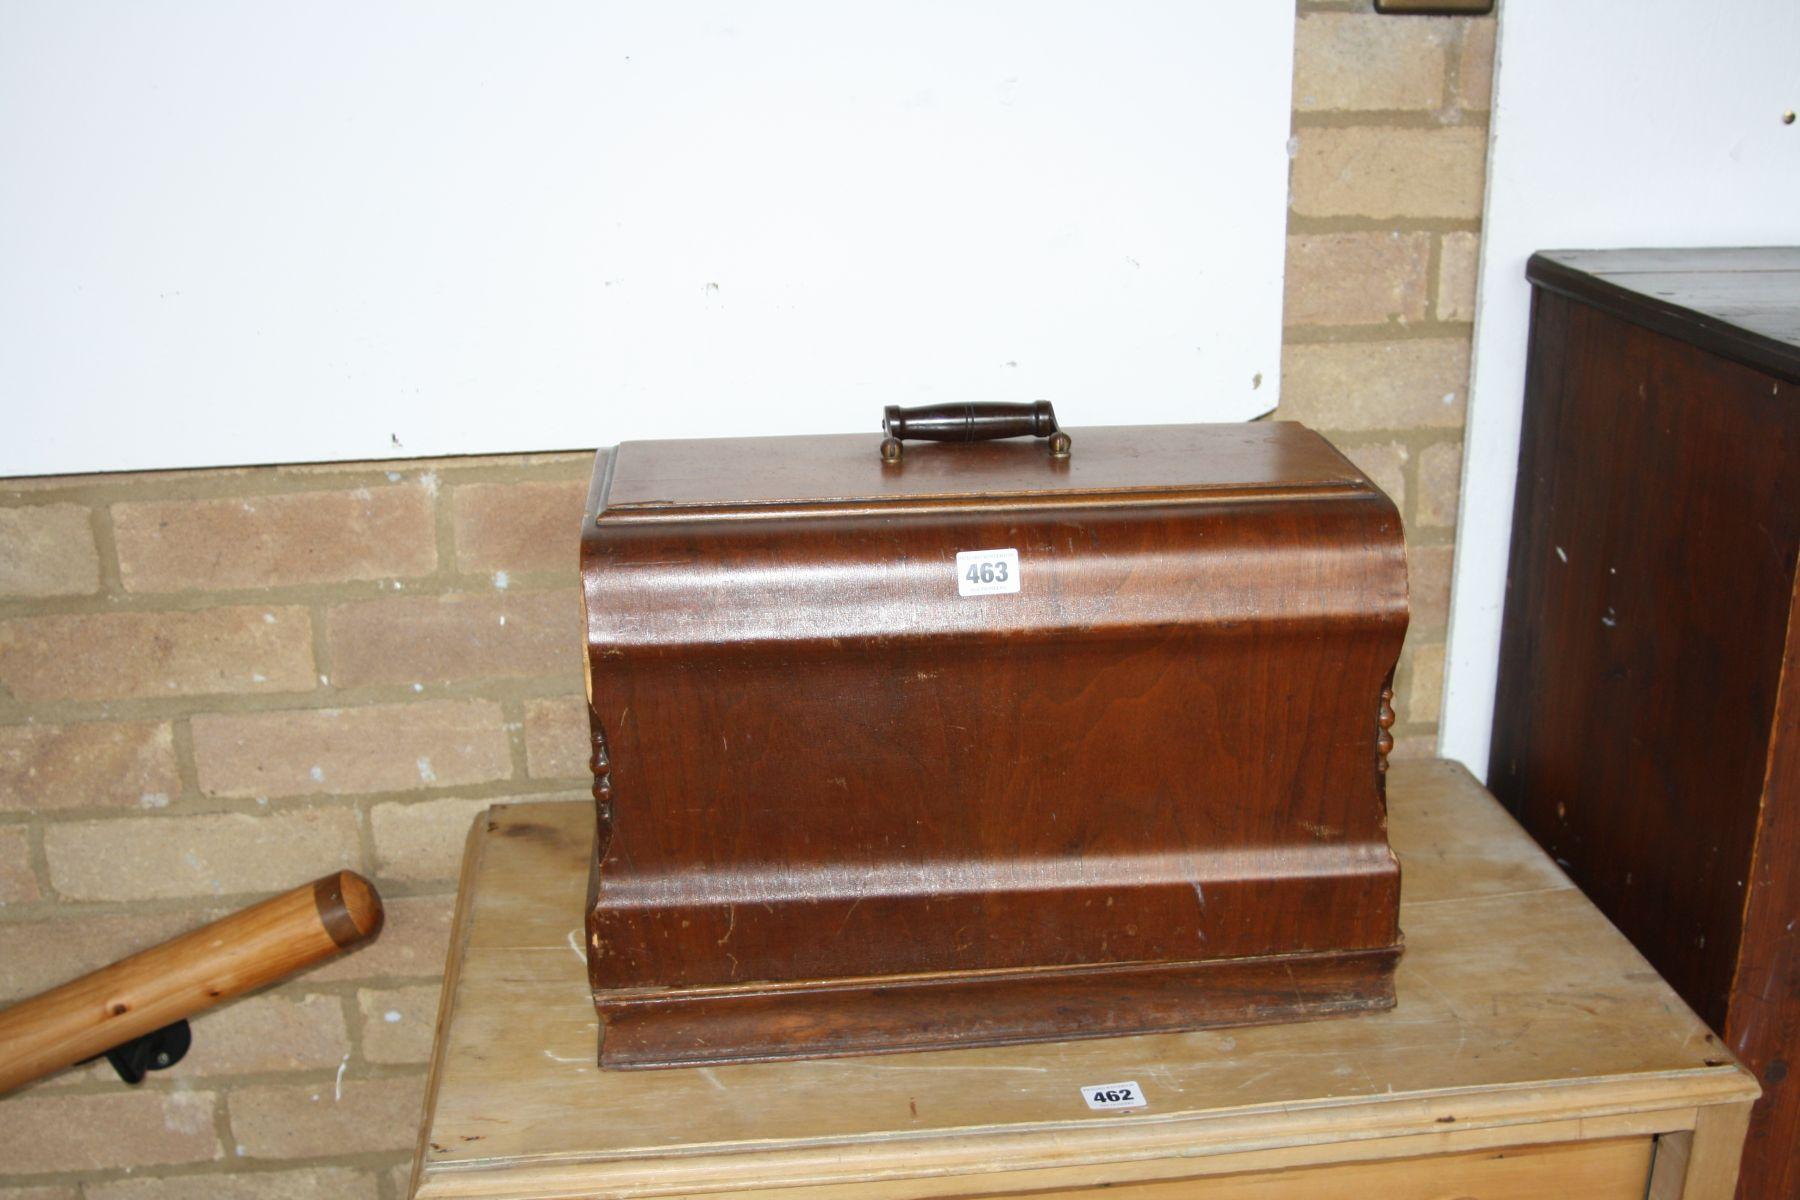 Lot 463 - A JONES WALNUT CASED MANUAL SEWING MACHINE, 43x23x33cm high